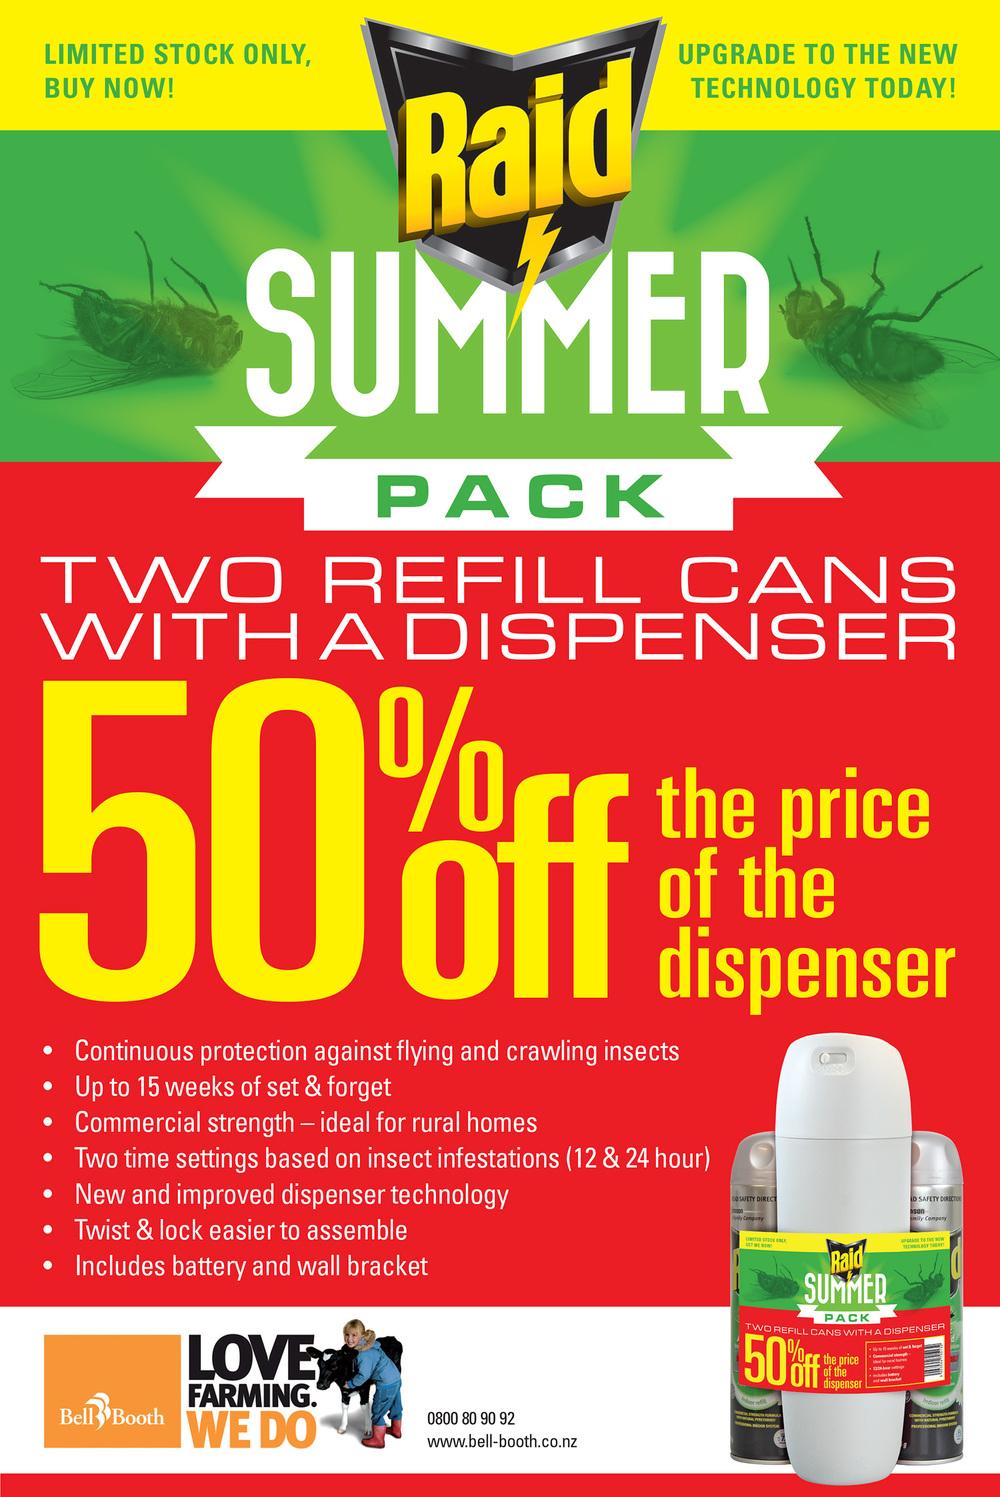 Raid Summer Pack advert 280x187mm.jpg